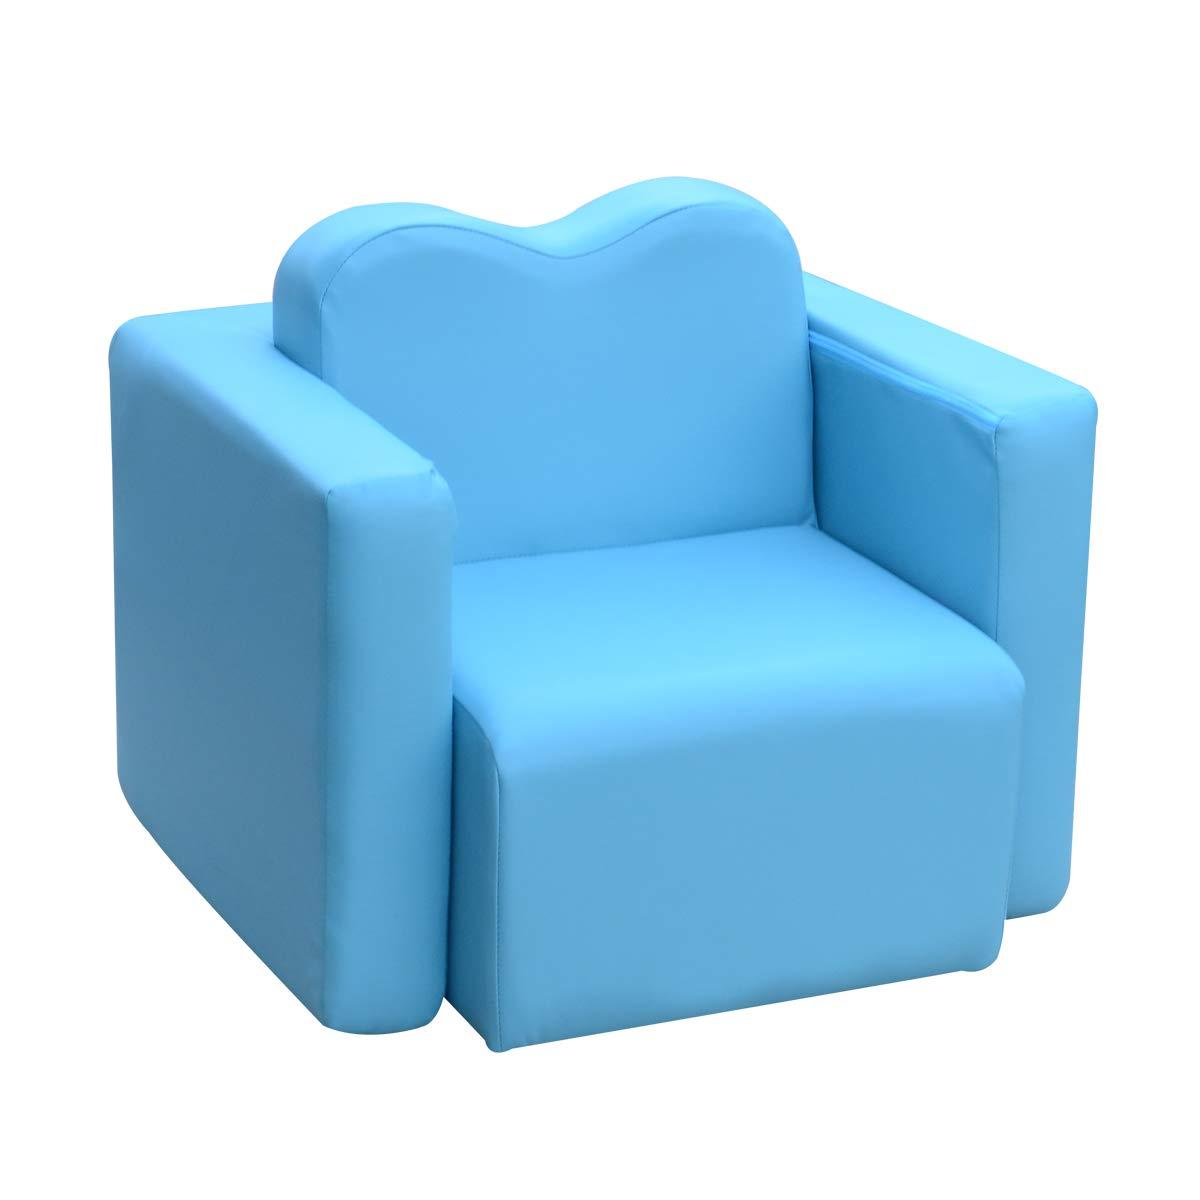 Lightweight Design Kids Sofa 2-in-1 Multi-Functional Children Table & Chair Set Living Room Furniture Armrest Couch for Boys & Girls Blue